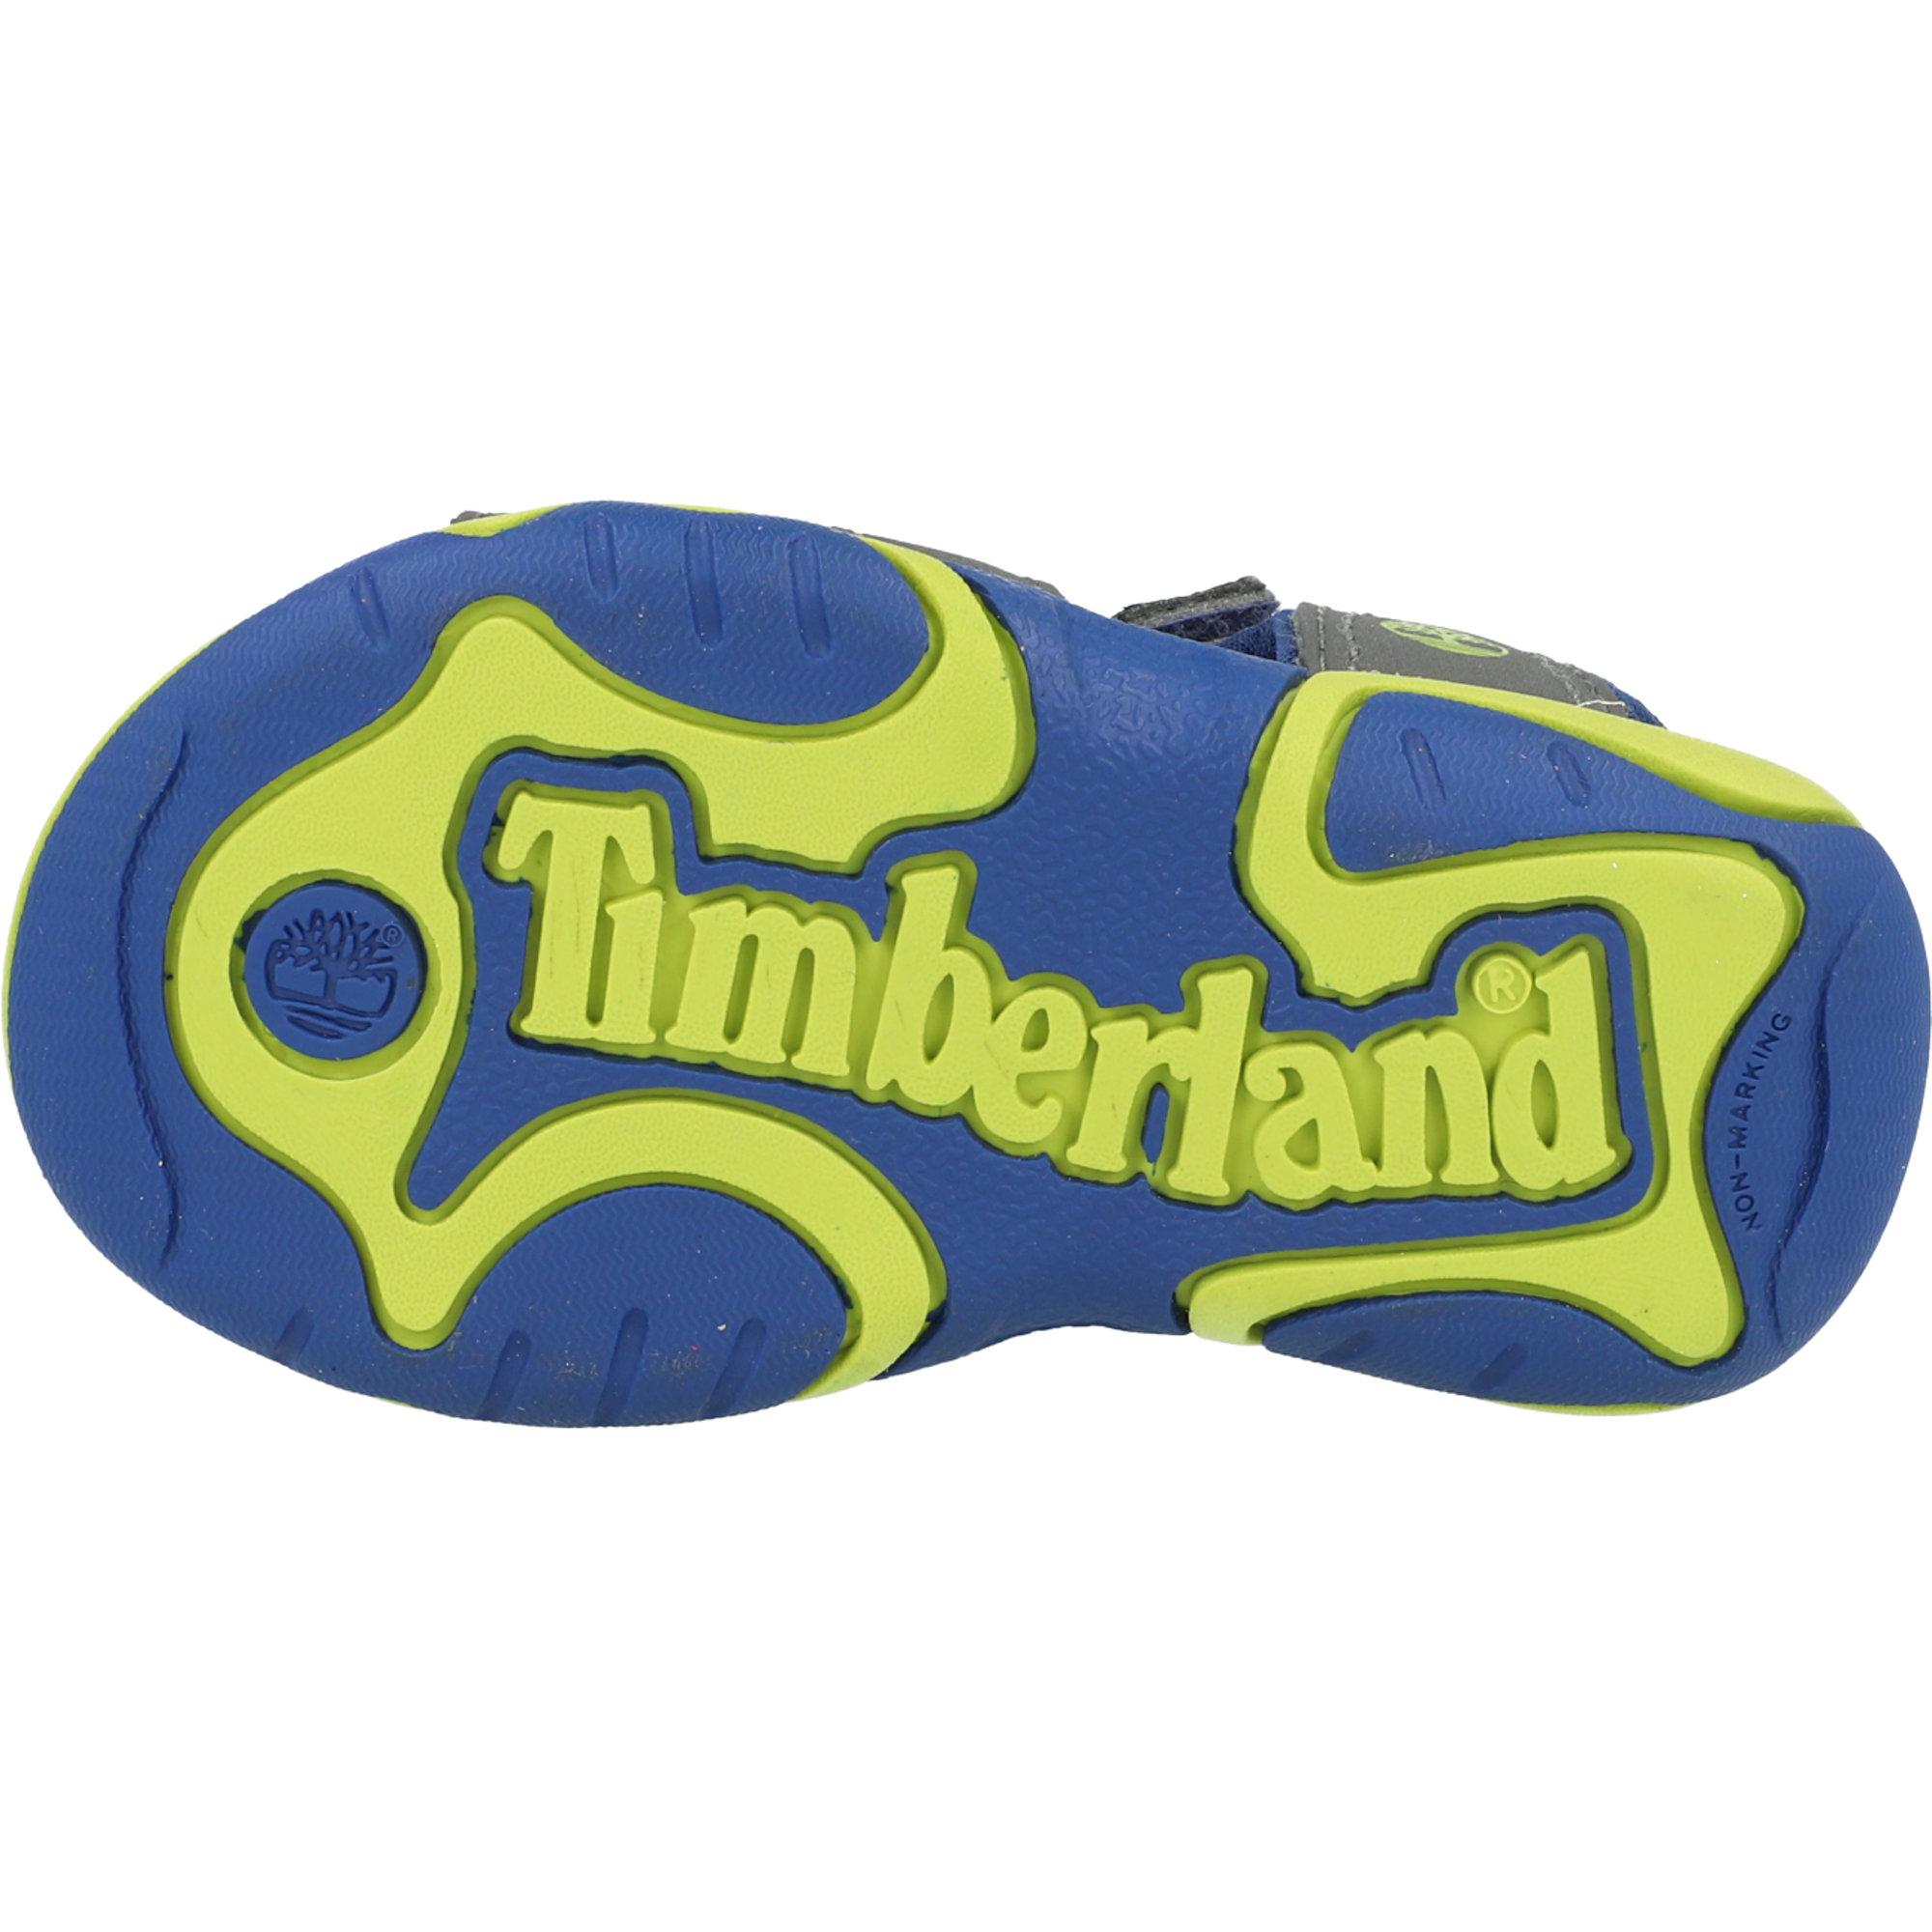 Timberland Adventure Seeker Dunkelgrau Synthetische Kleinkind Gurt Sandalen